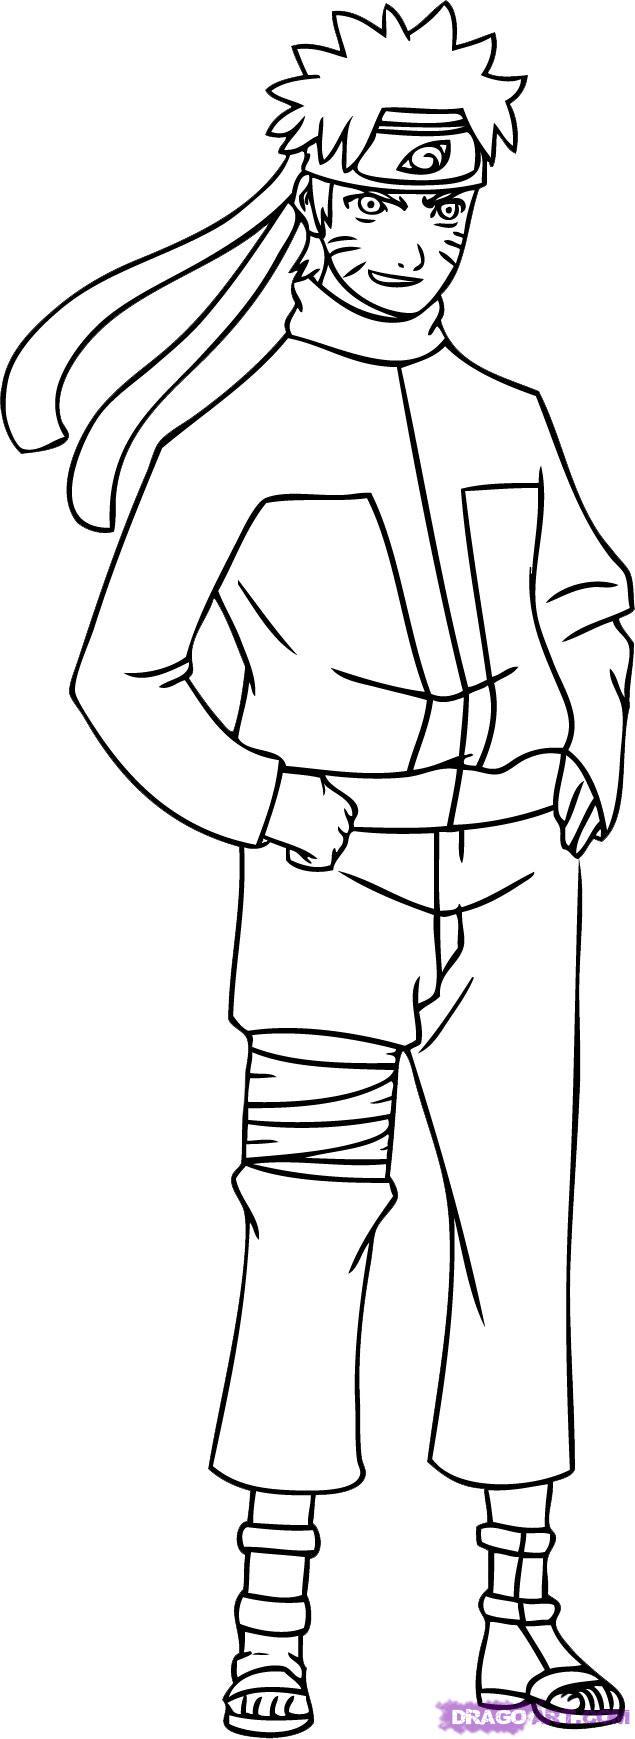 635x1739 Easy Drawings Of Naruto